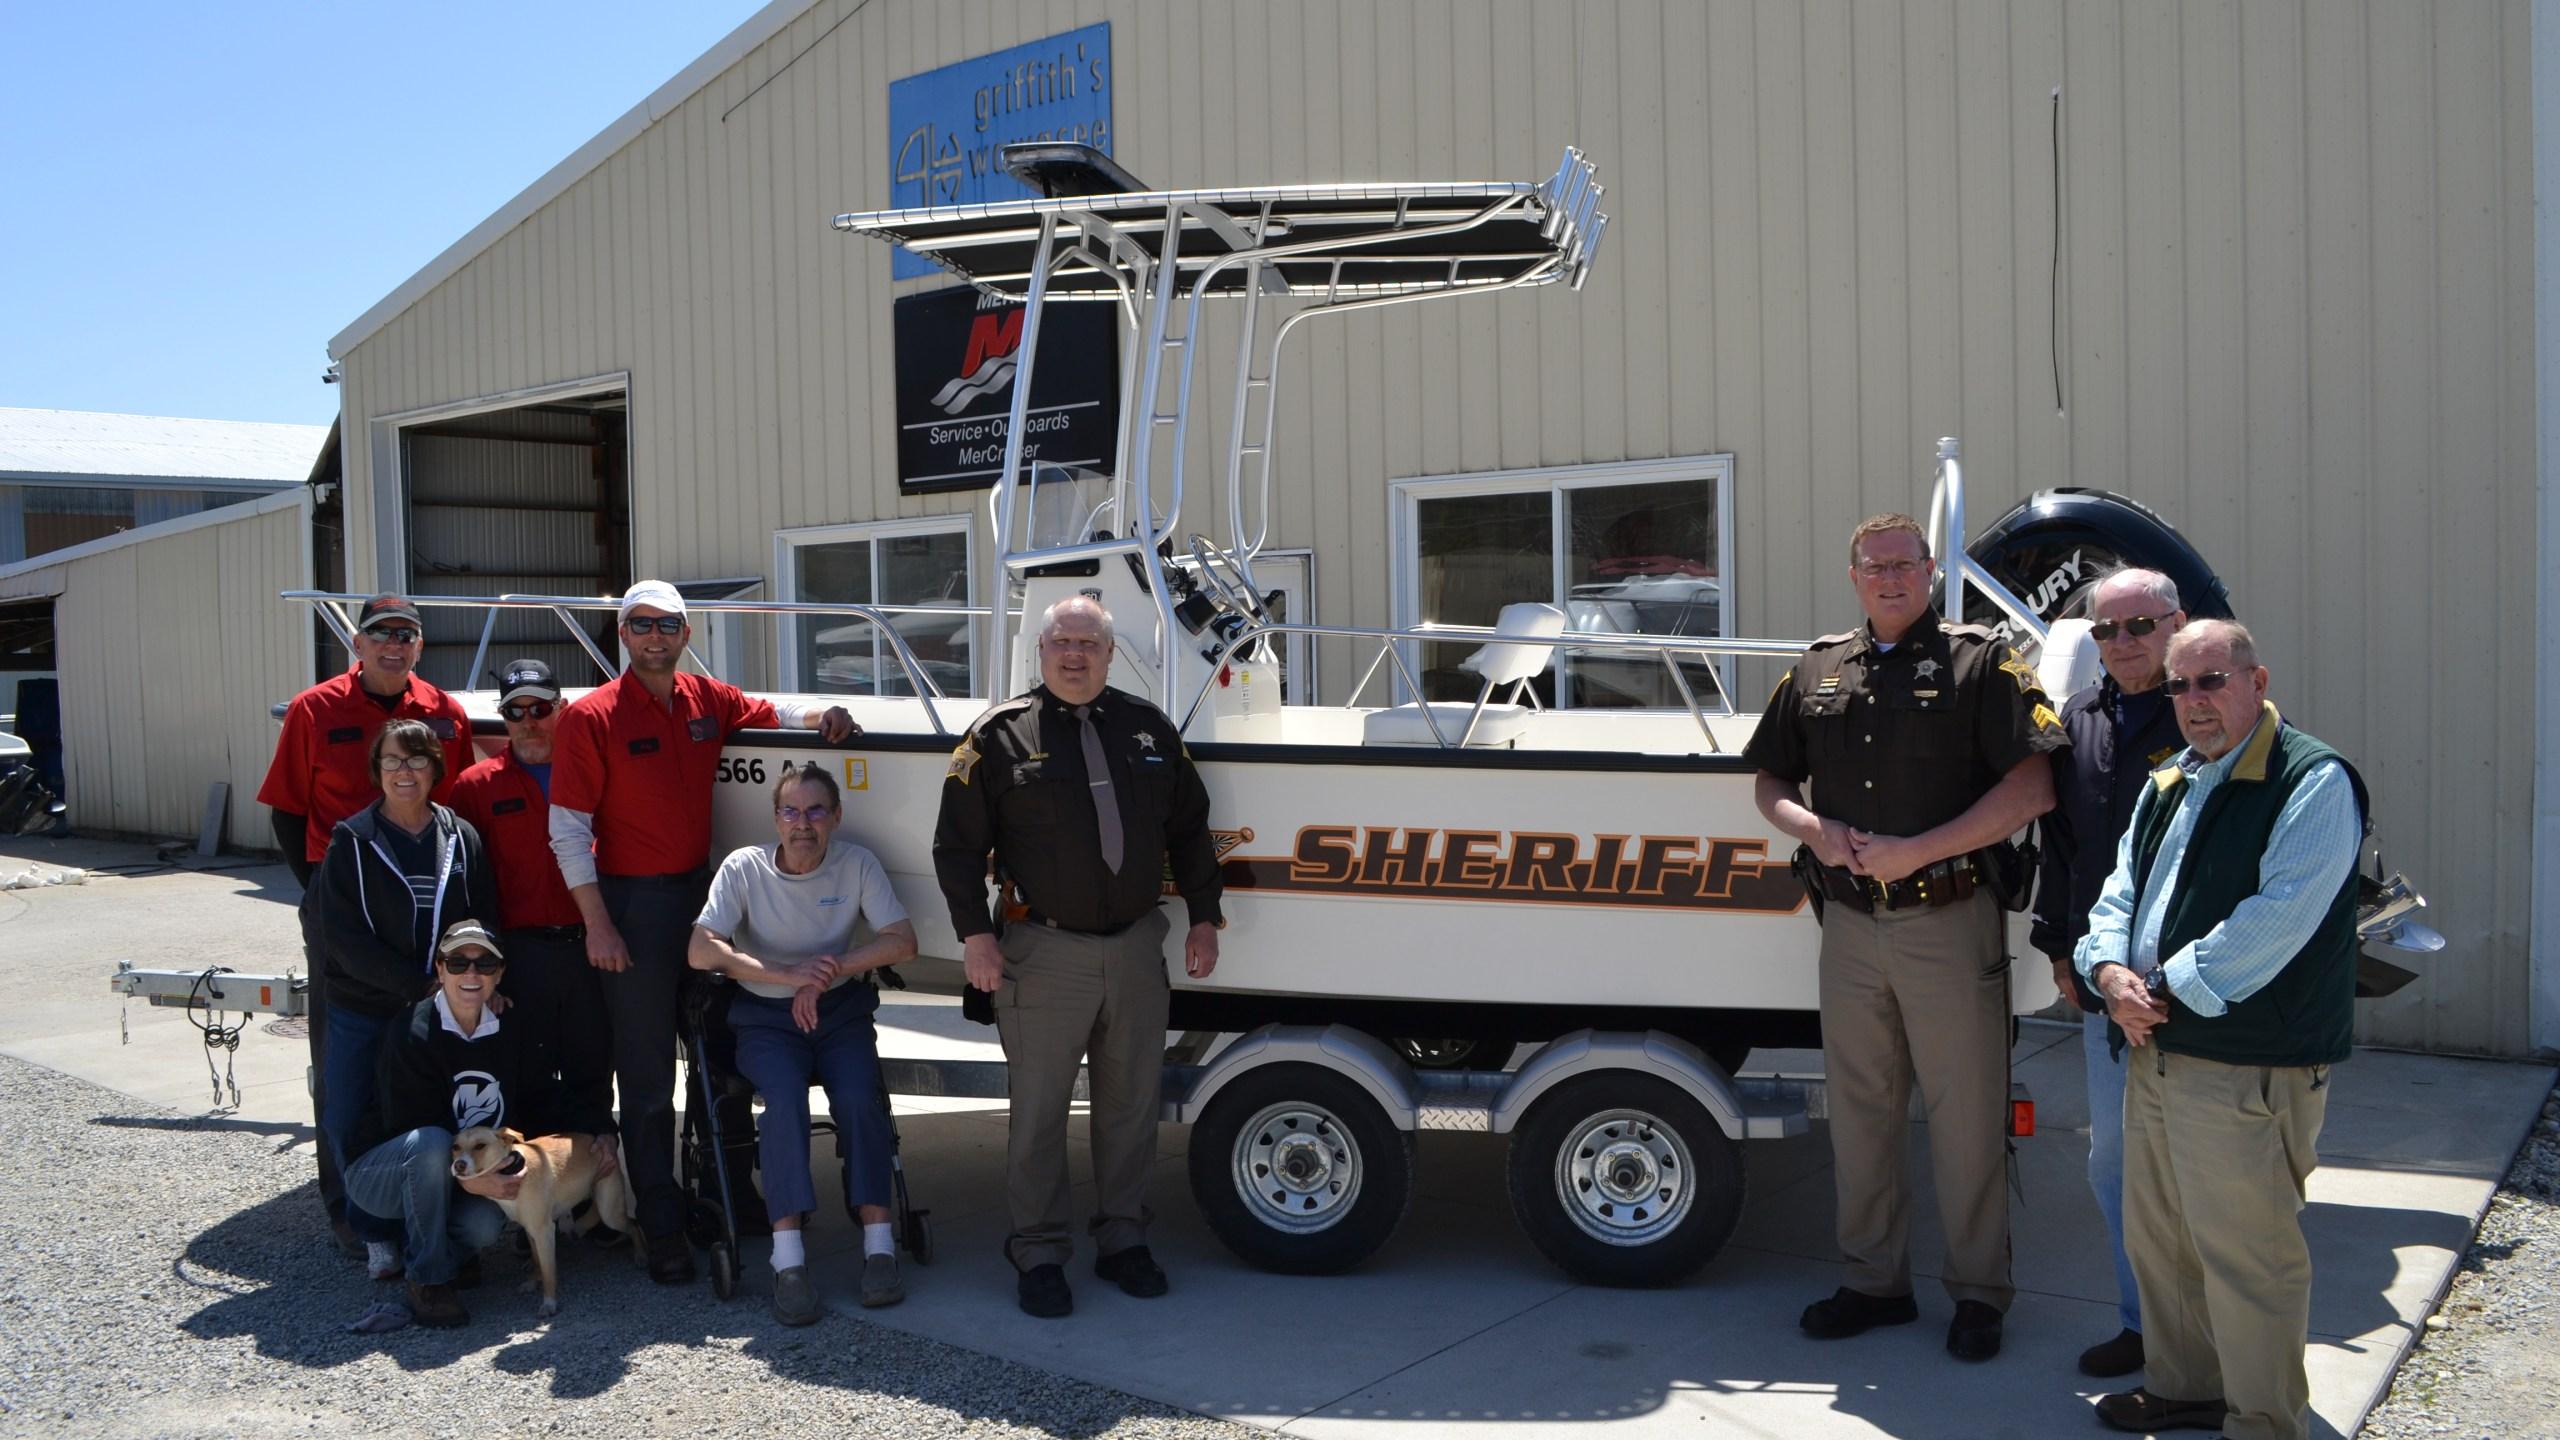 Kosciusko Co. Sheriff's Department patrol boat